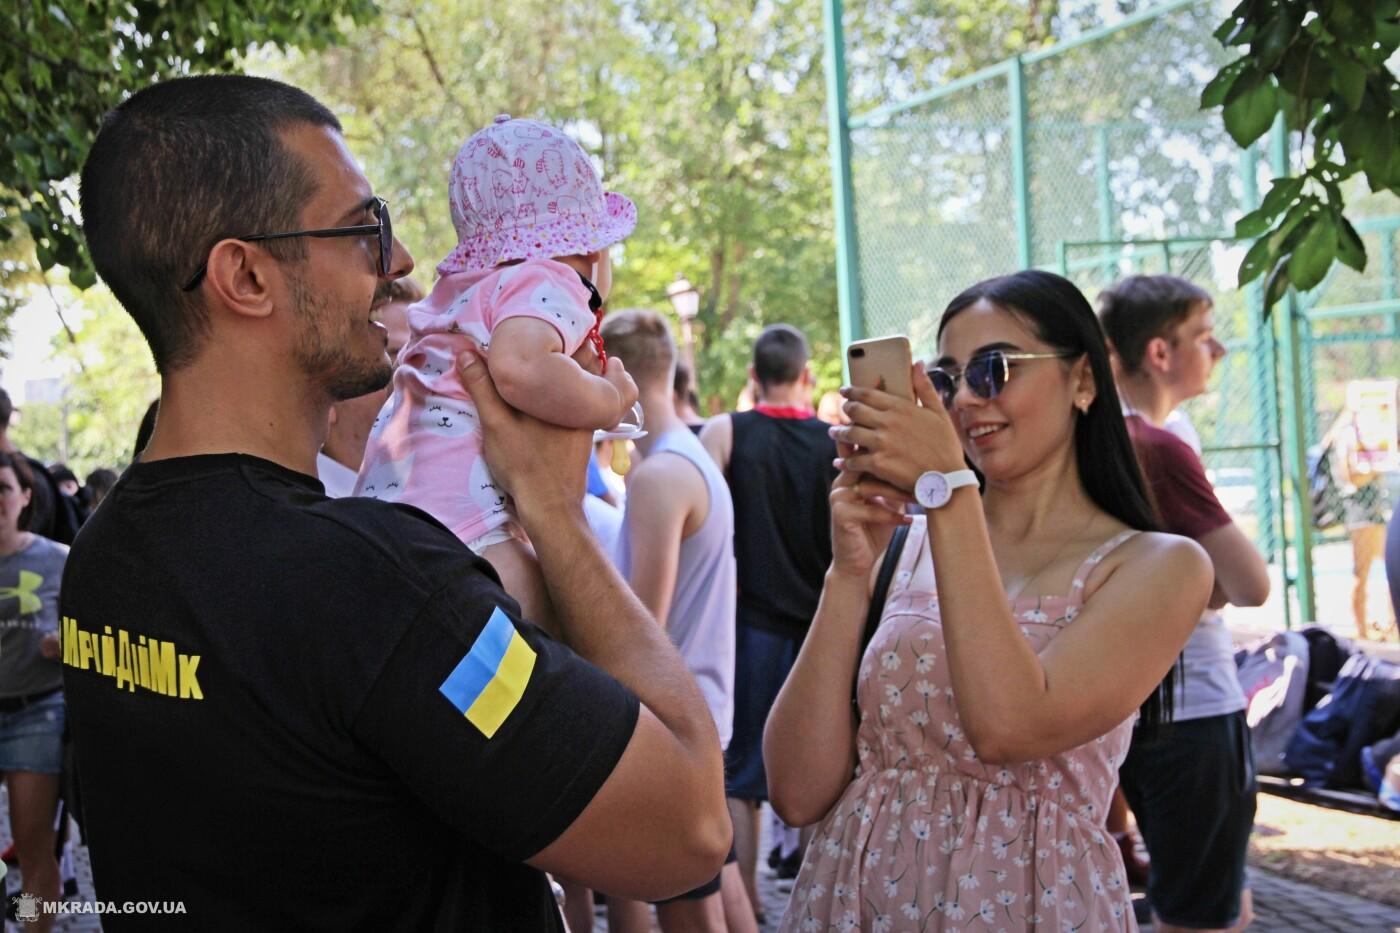 Команда «МрийДий» представила первую в Украине баскетбольную площадку в стиле street art, - ФОТО, фото-8